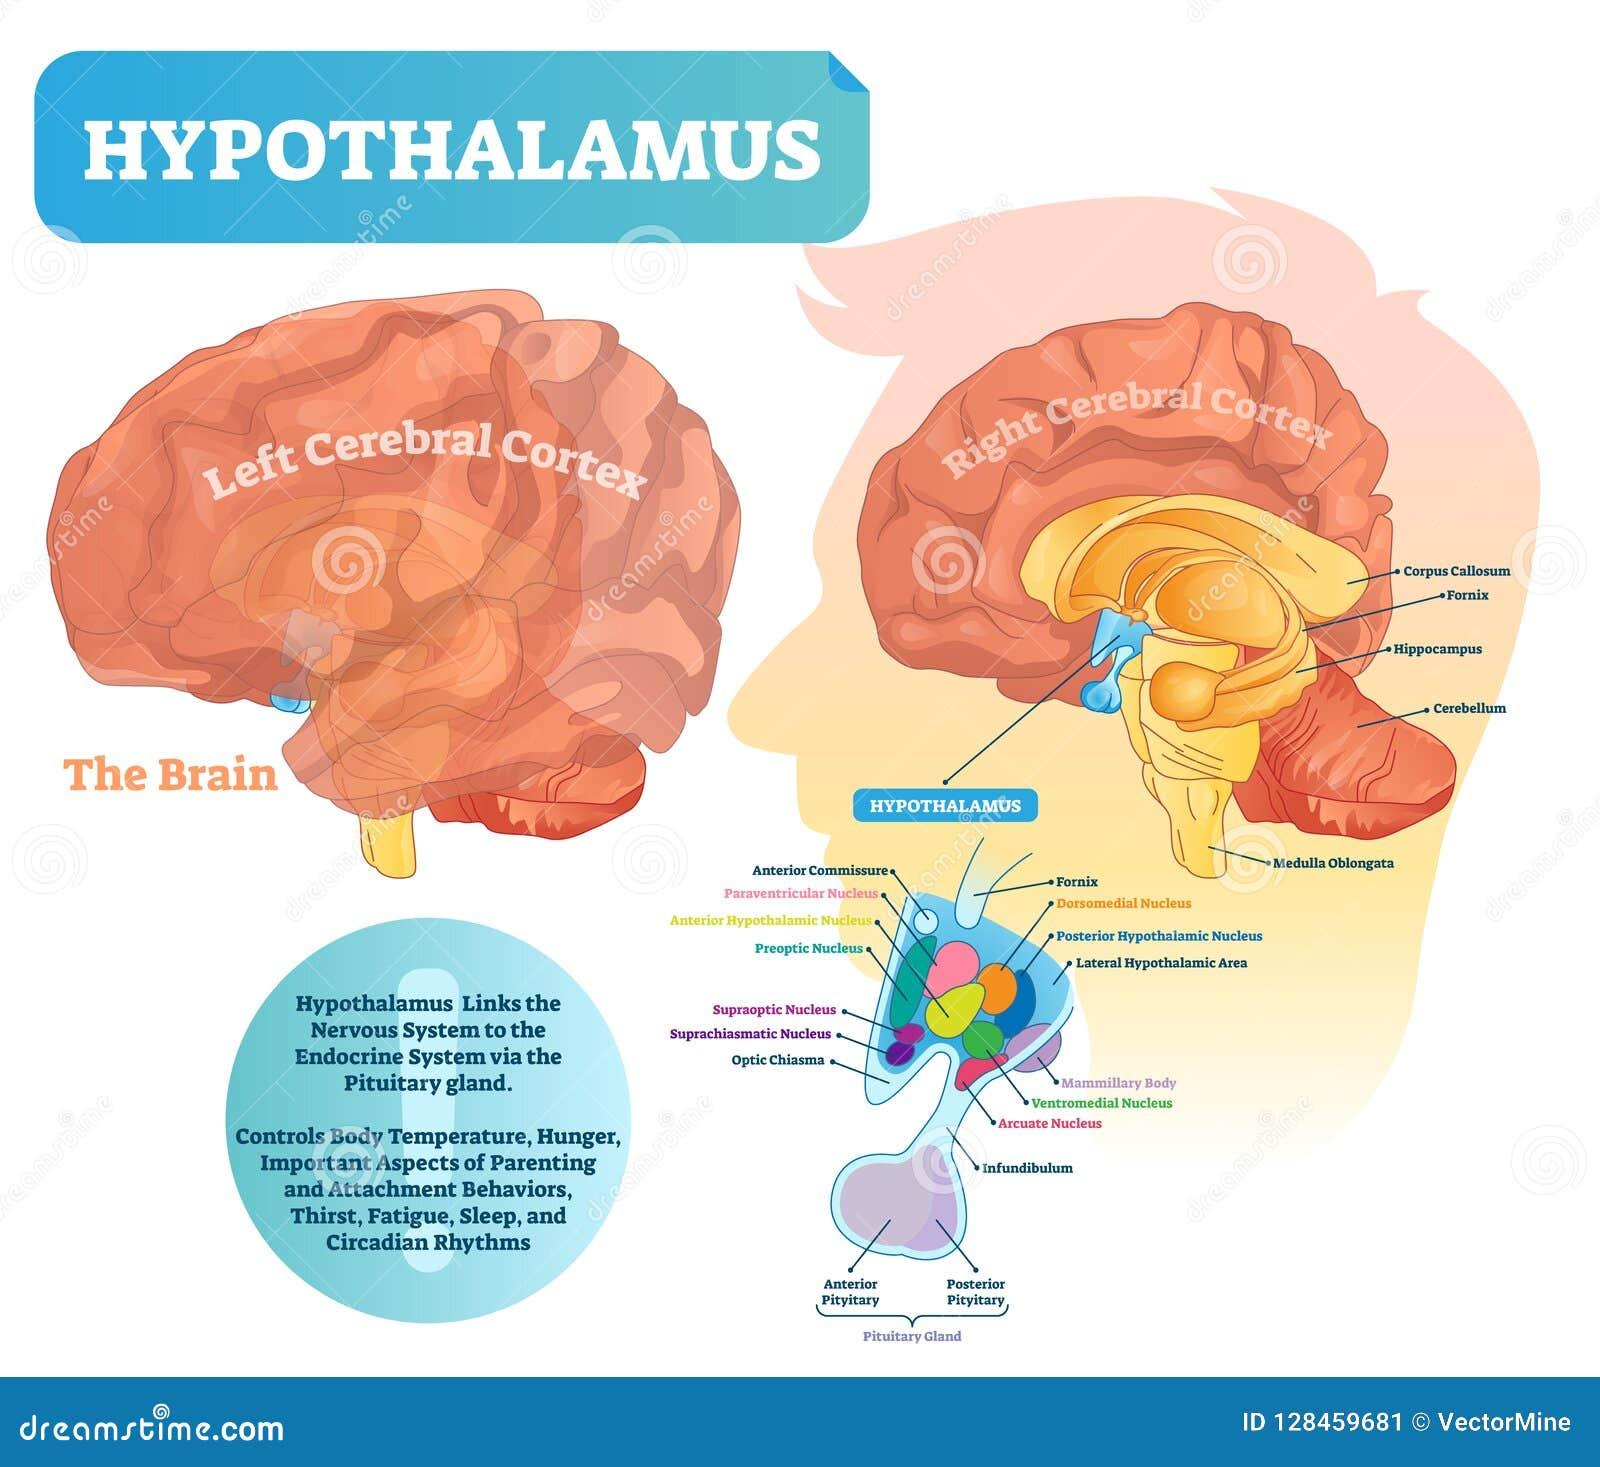 Hypothalamus Vector Illustration Labeled Diagram With Brain Part